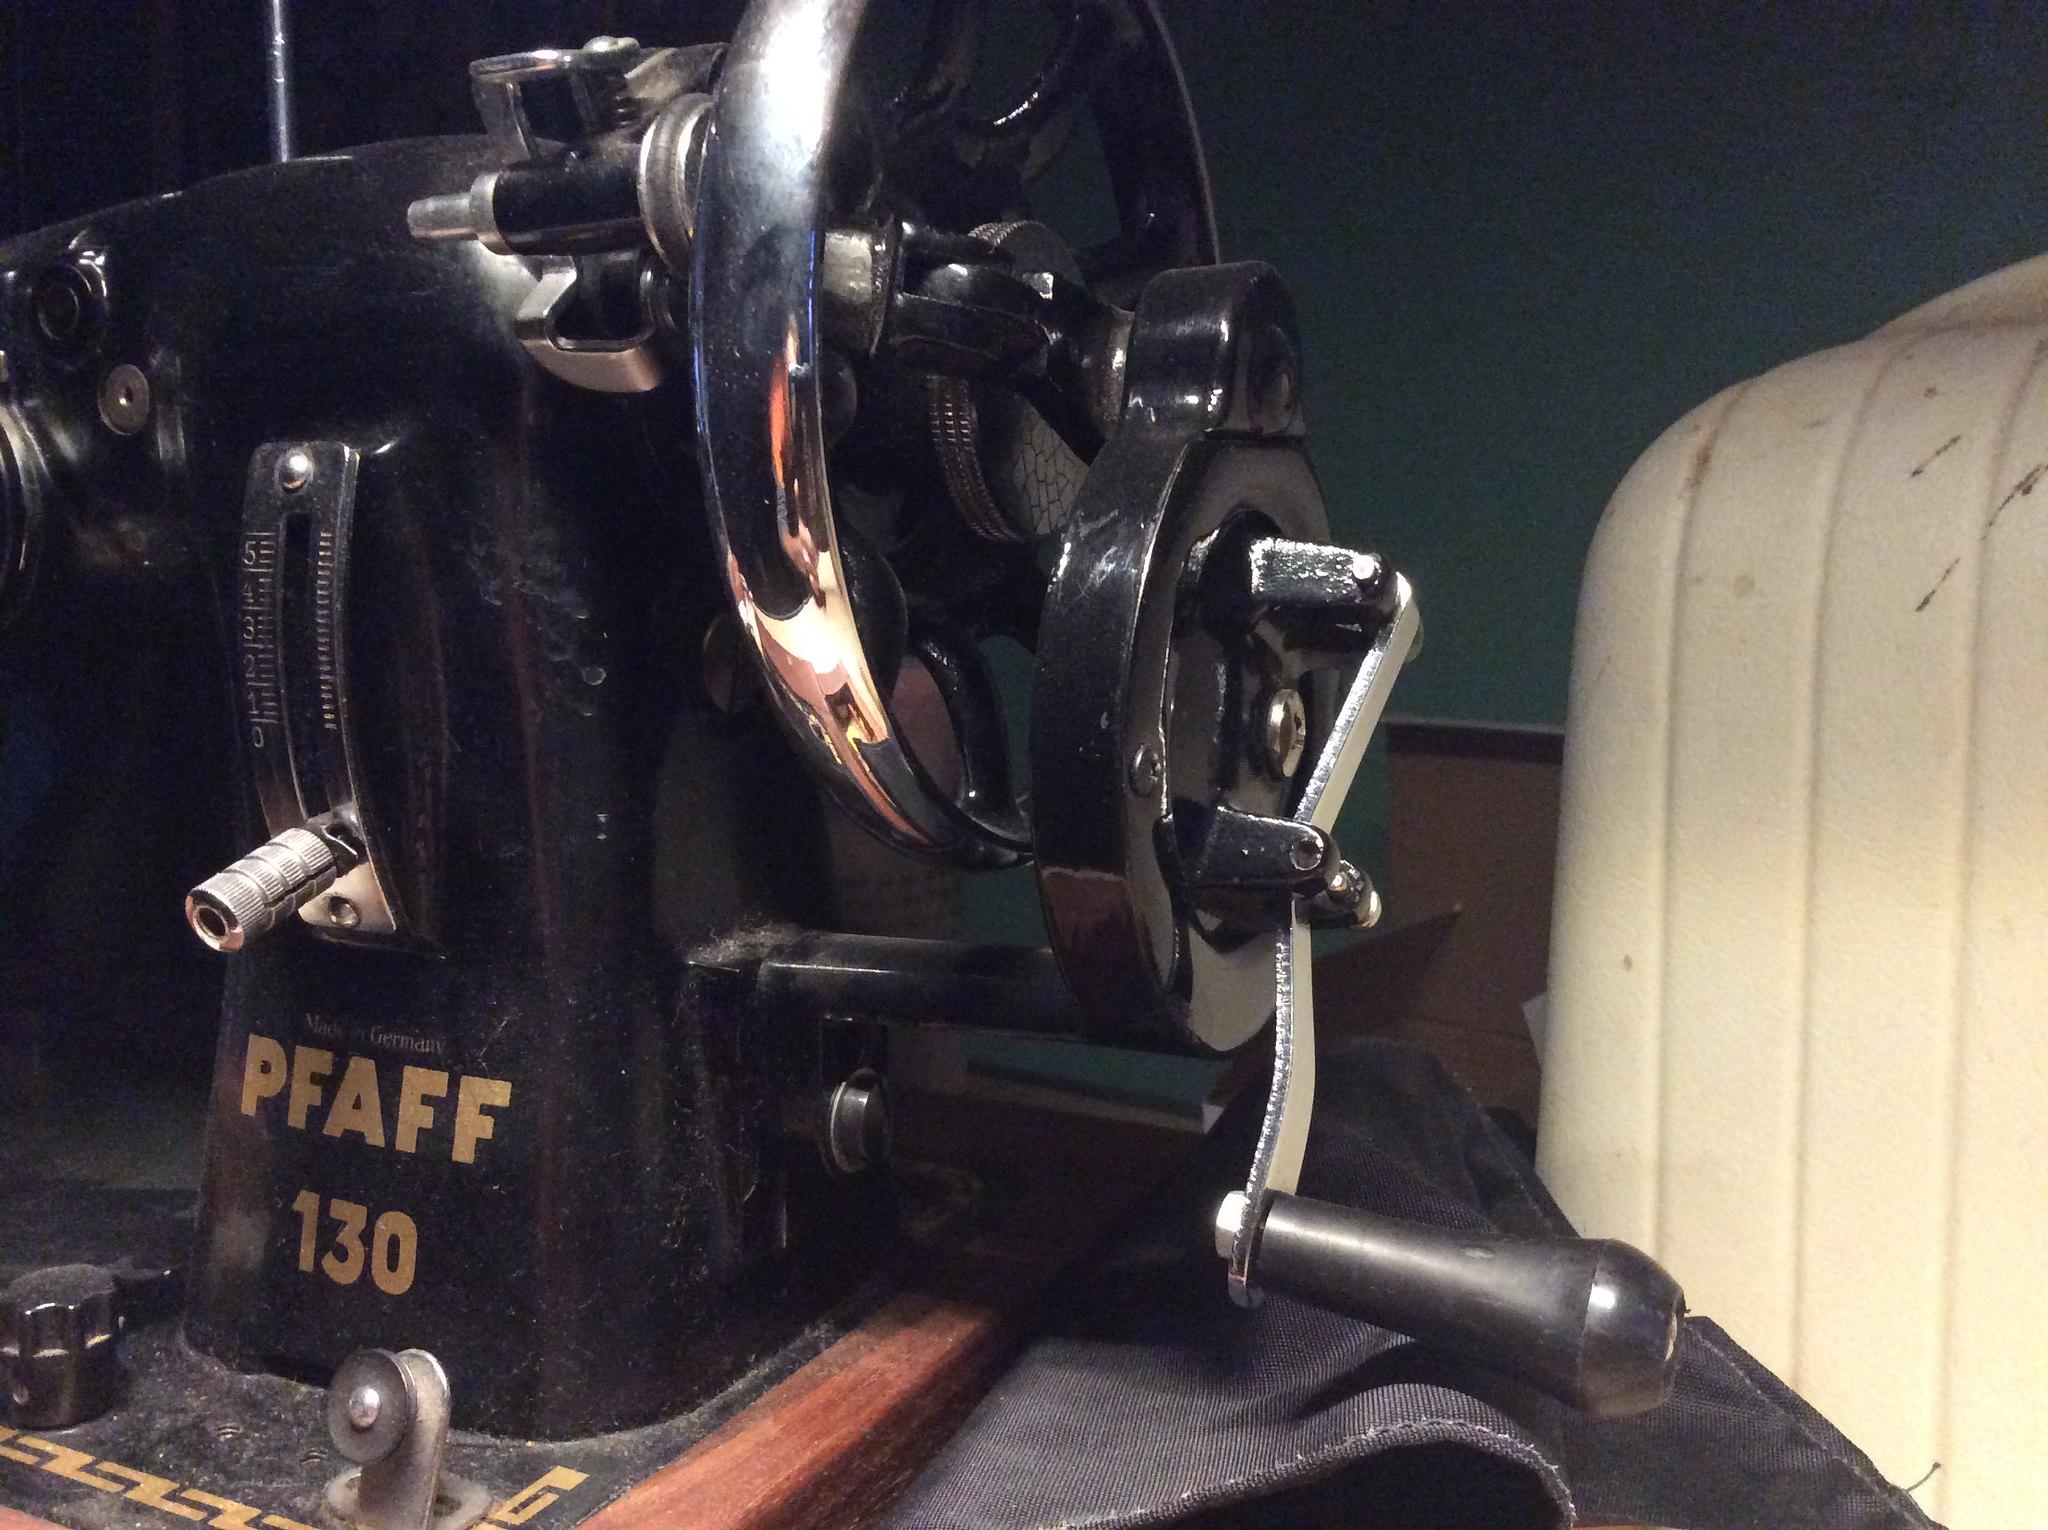 Vintage Sewing Machines For Diy Bikepacking Gear Mtbrcom Necchi Bu Machine Threading Diagram Pfaff 130 Handcrank Attachment